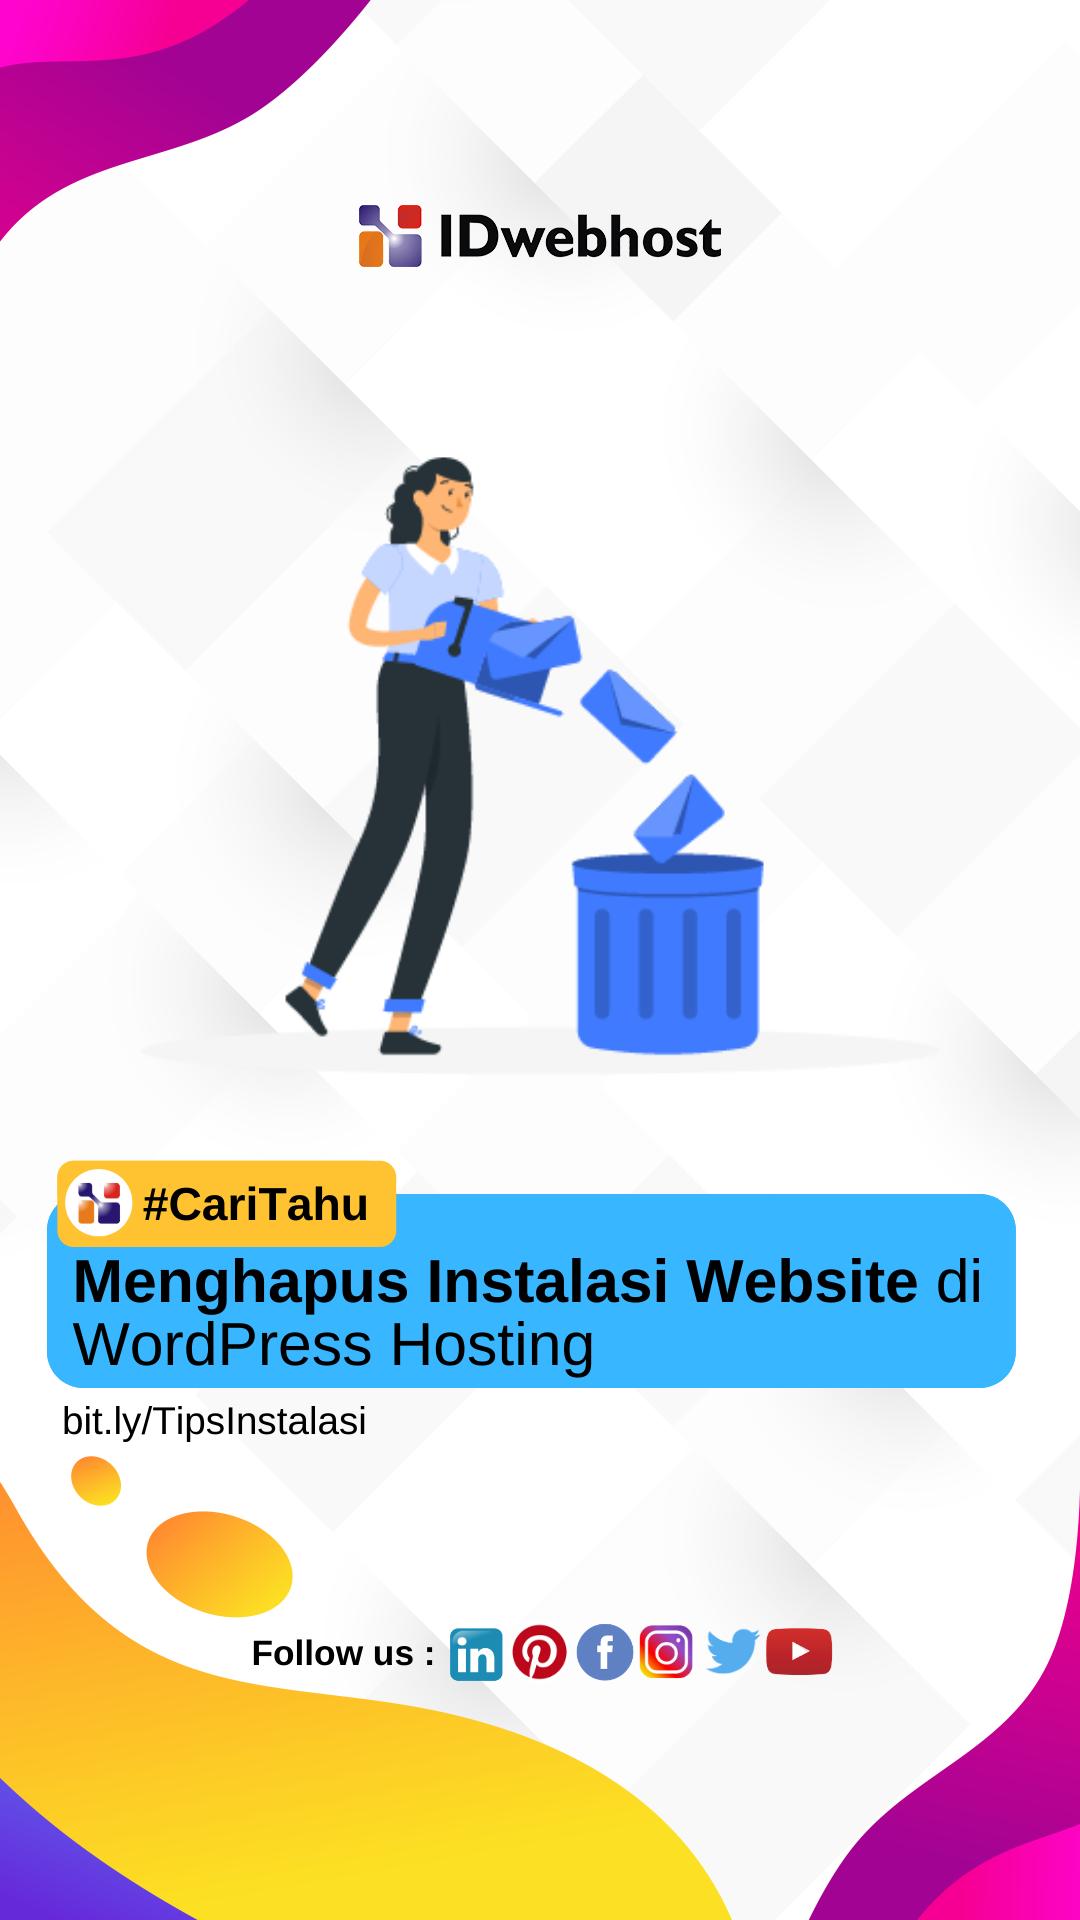 Menghapus Instalasi Website Di Wordpress Hosting Idwebhost Website Aplikasi Tahu